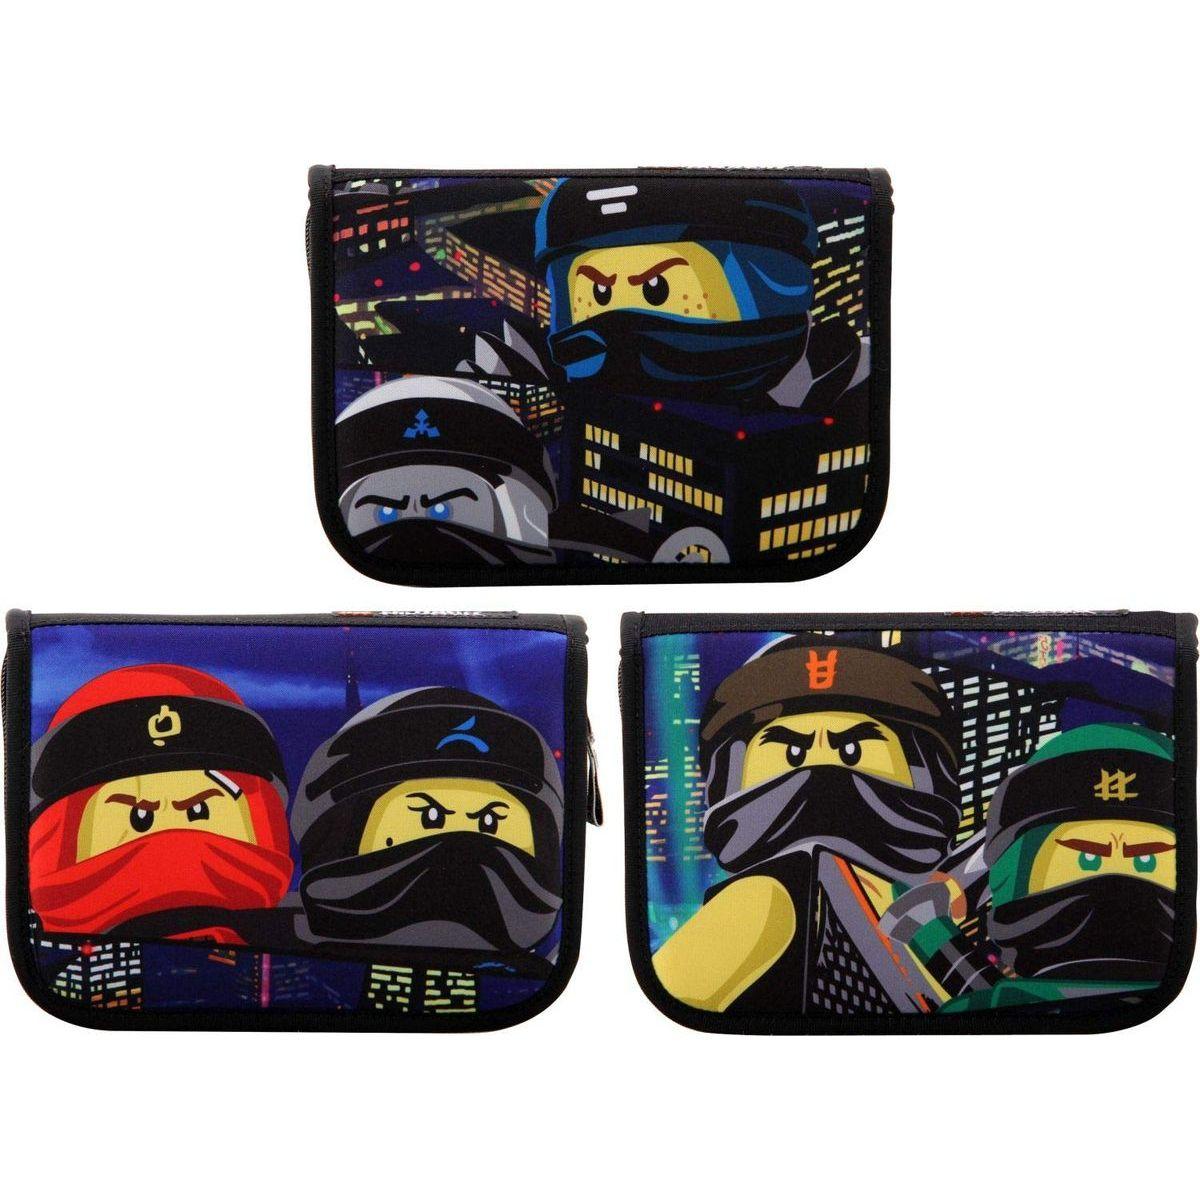 LEGO Ninjago Urban pouzdro s náplní